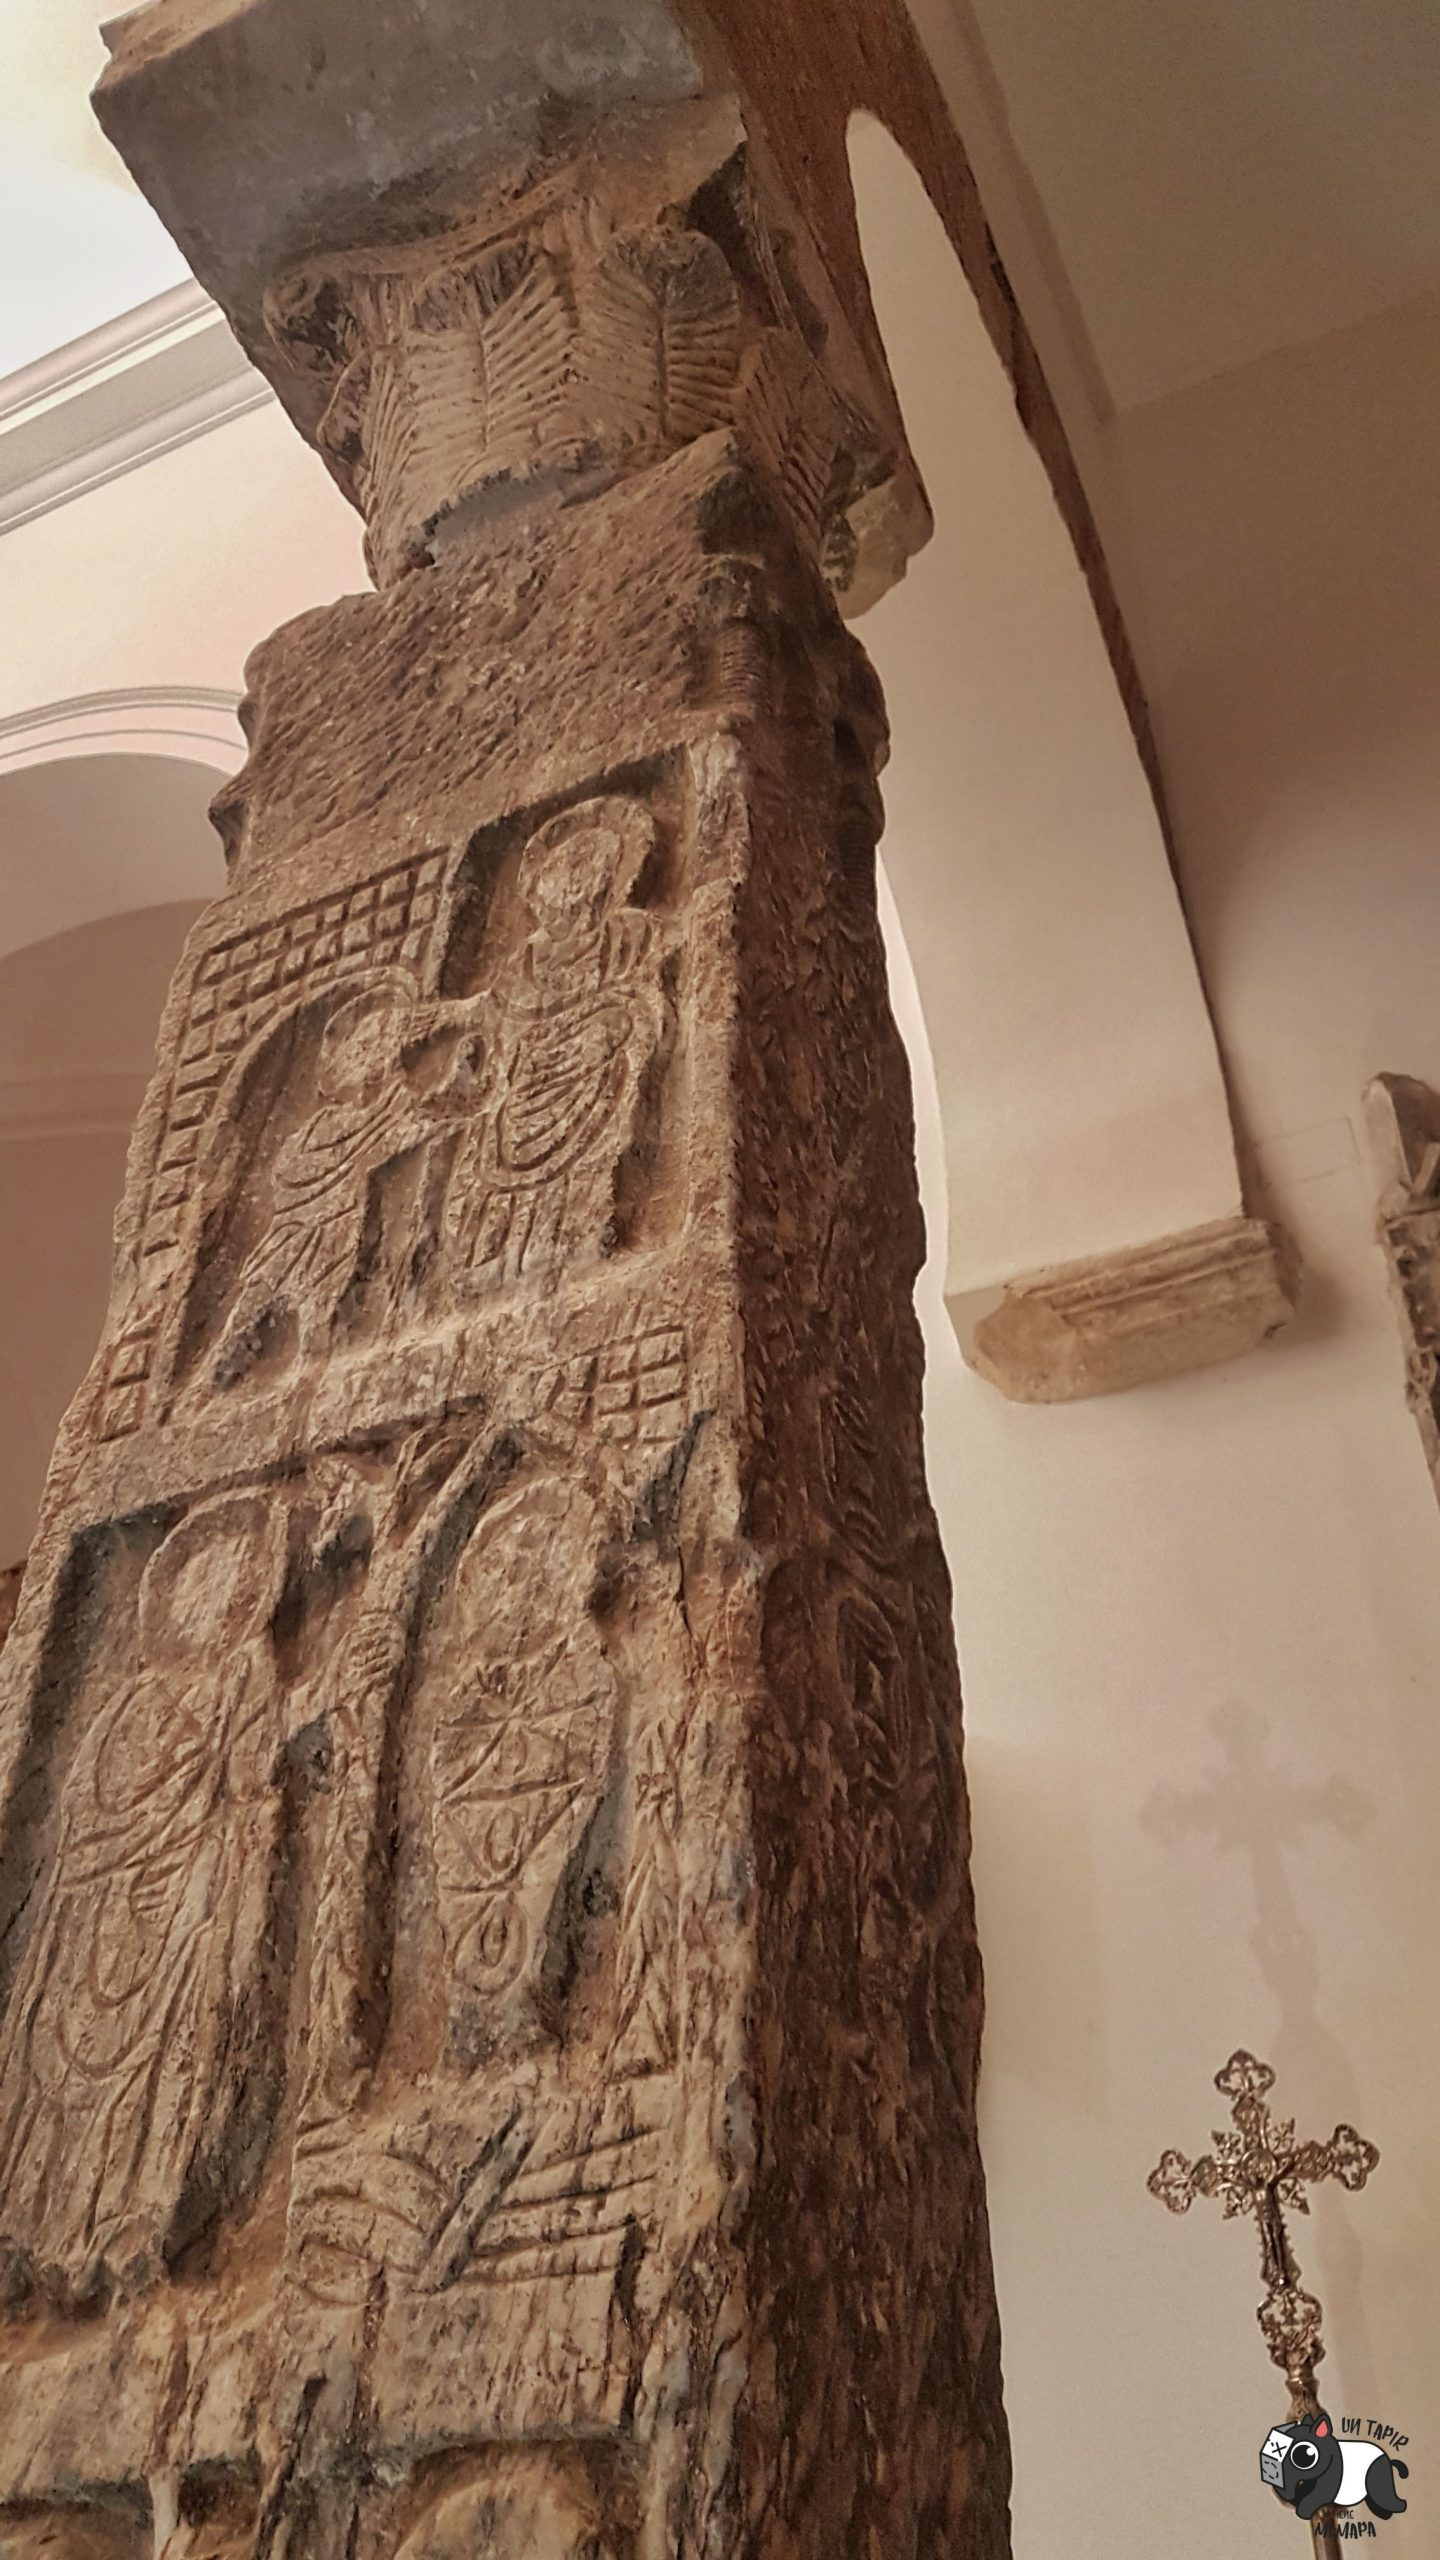 Pilastra visigoda de la Iglesia del Salvador